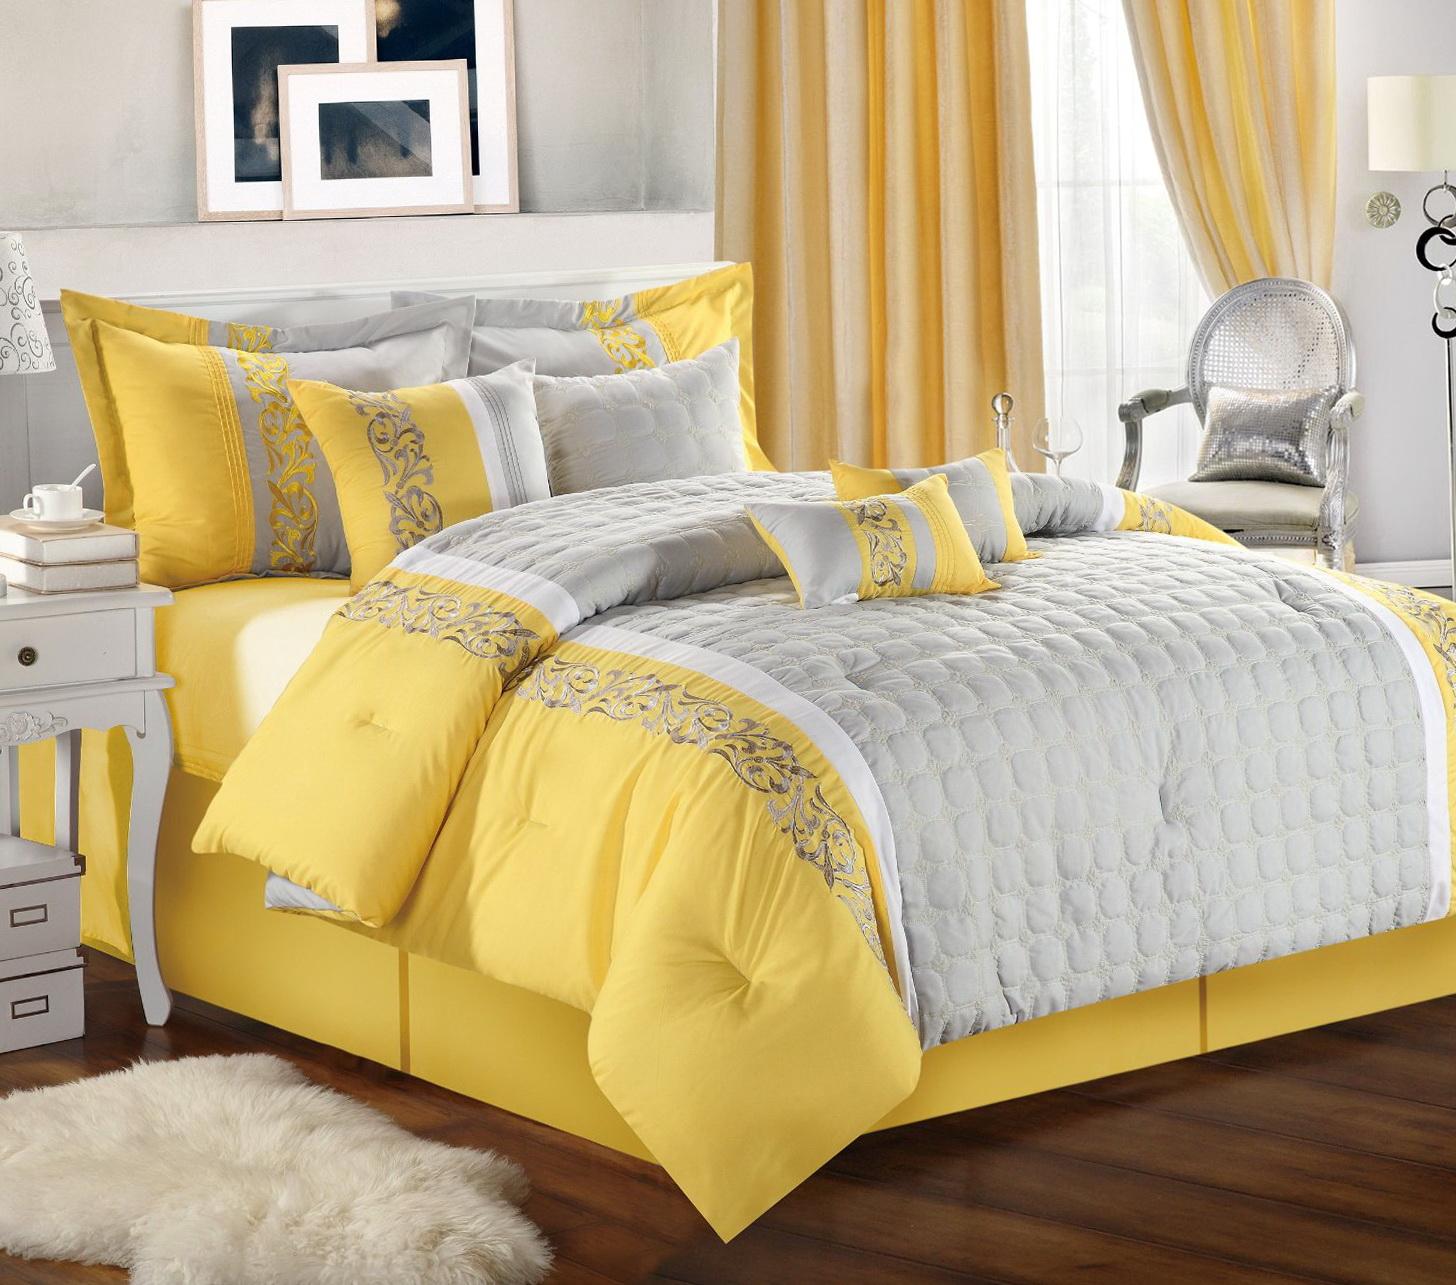 Gray And Yellow Bedding Kohls